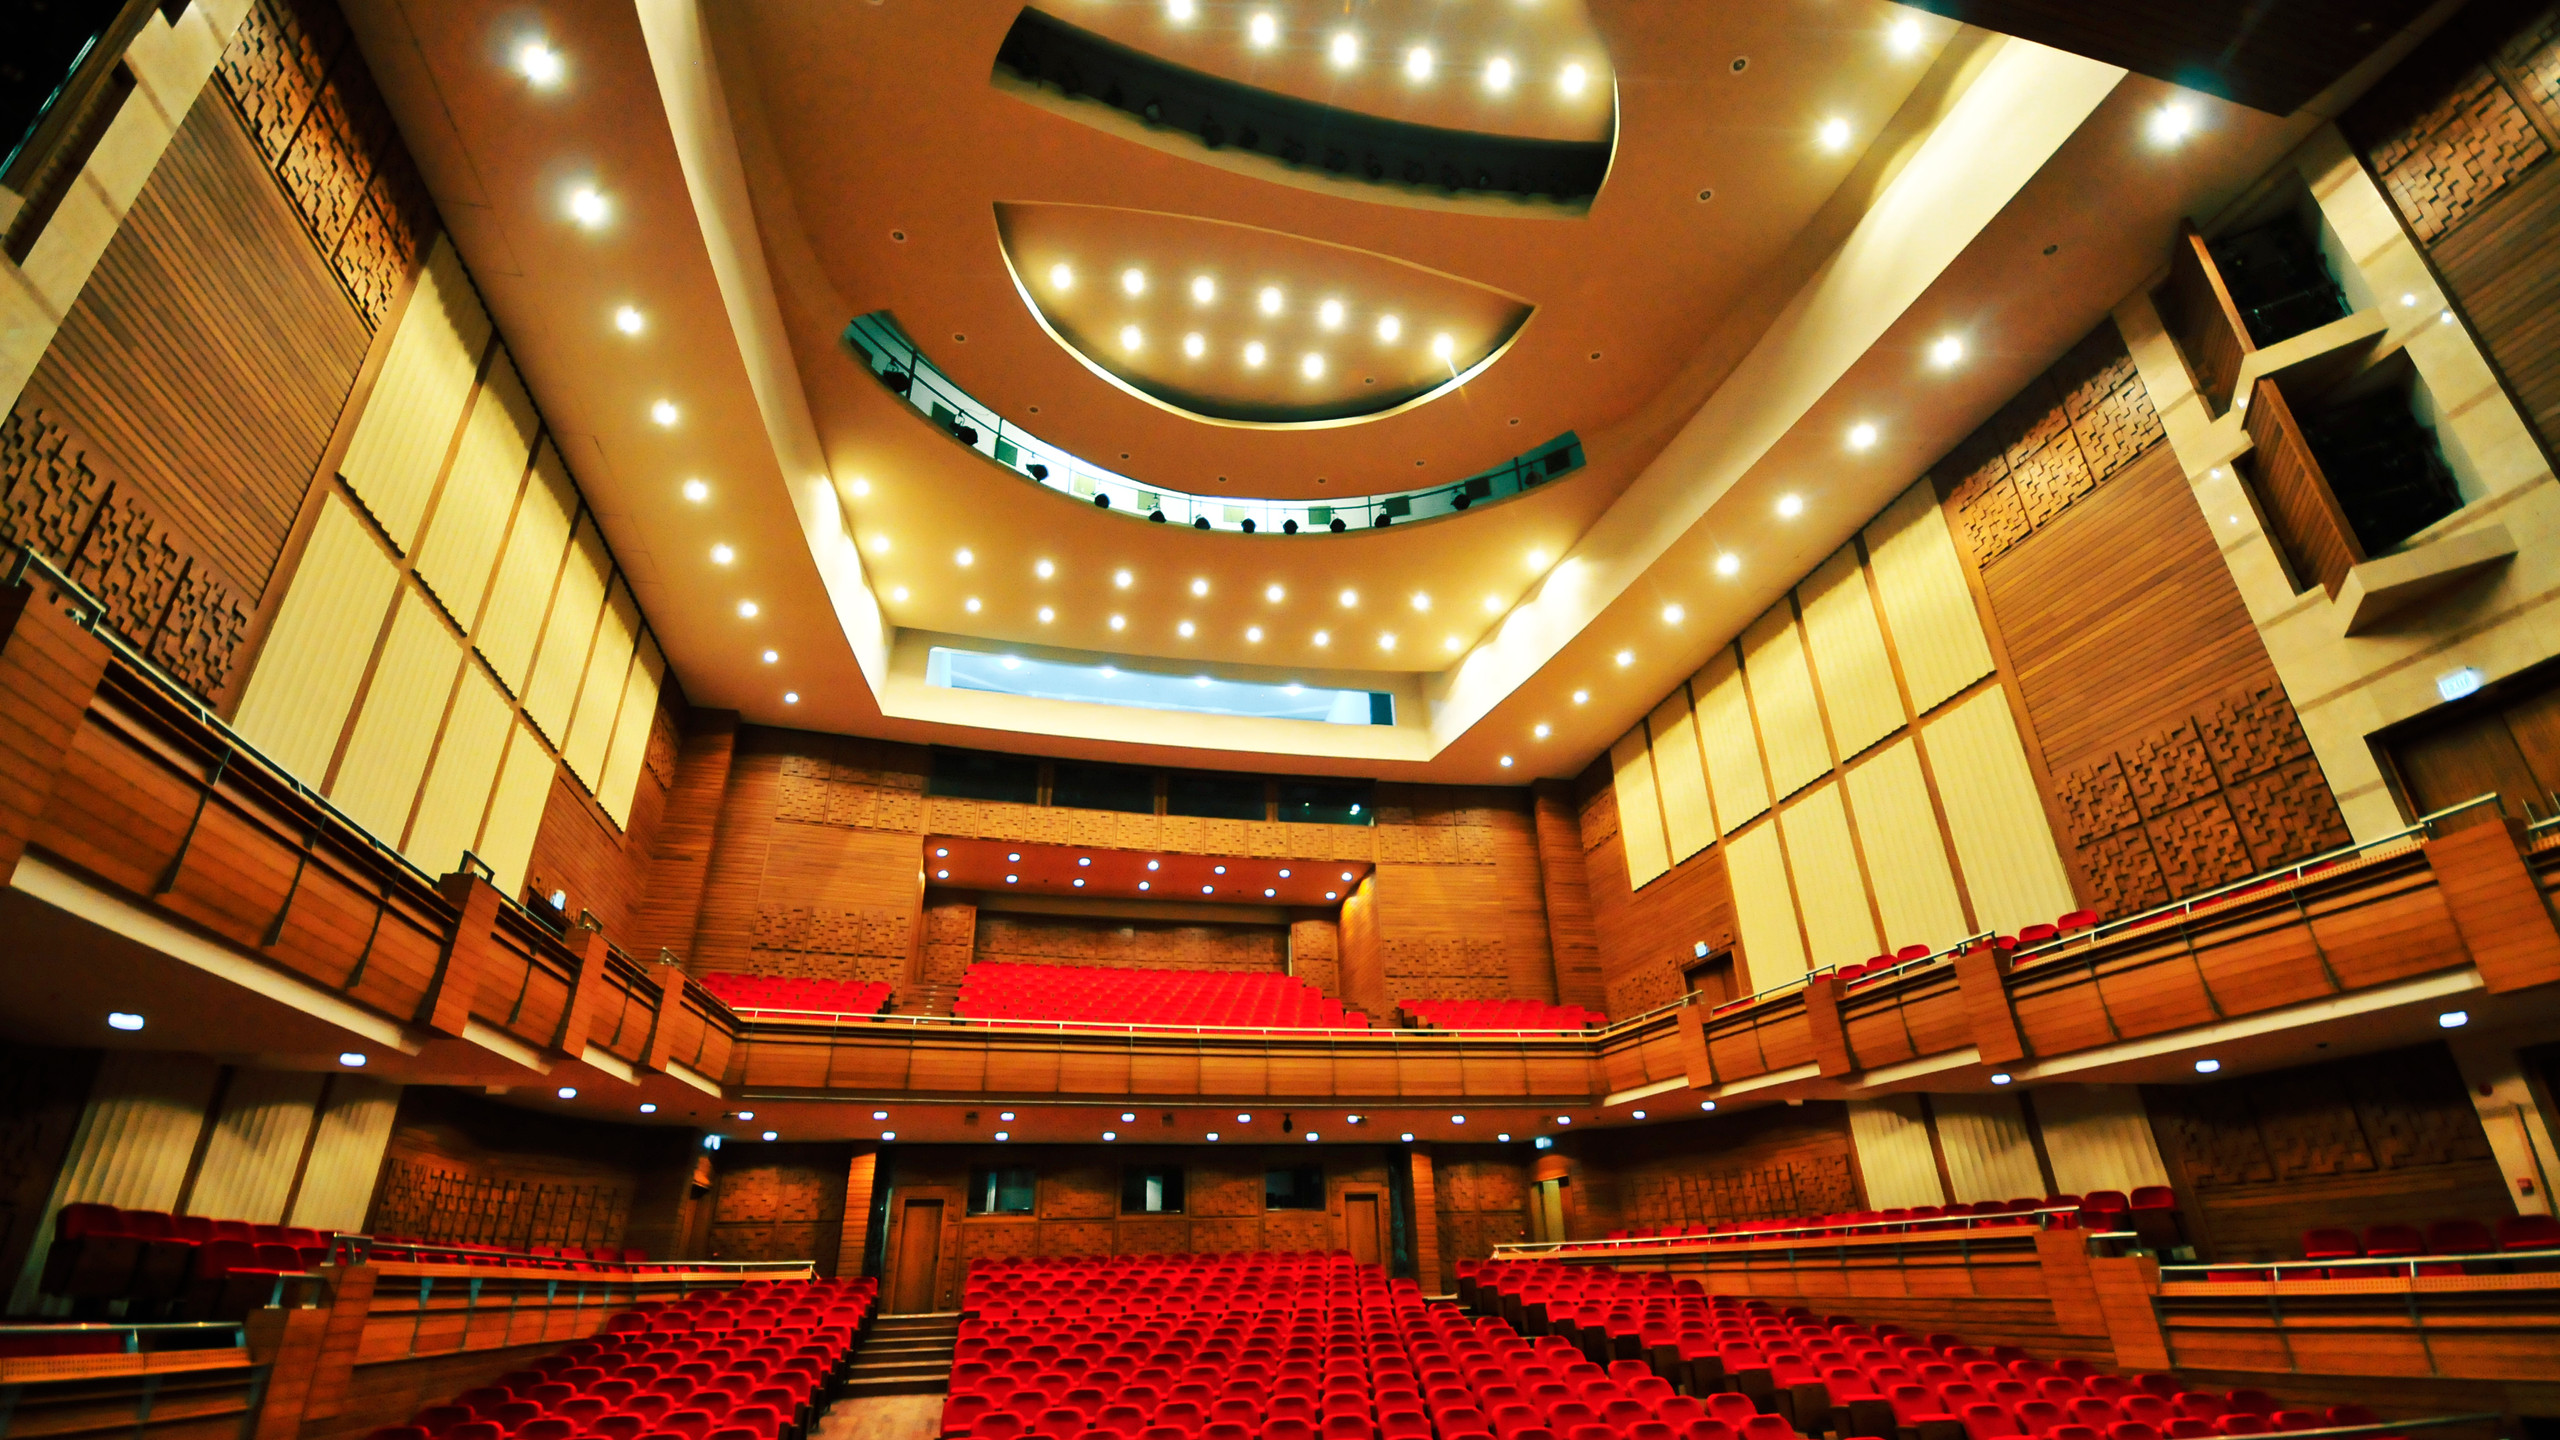 AASSM Konser Salonu